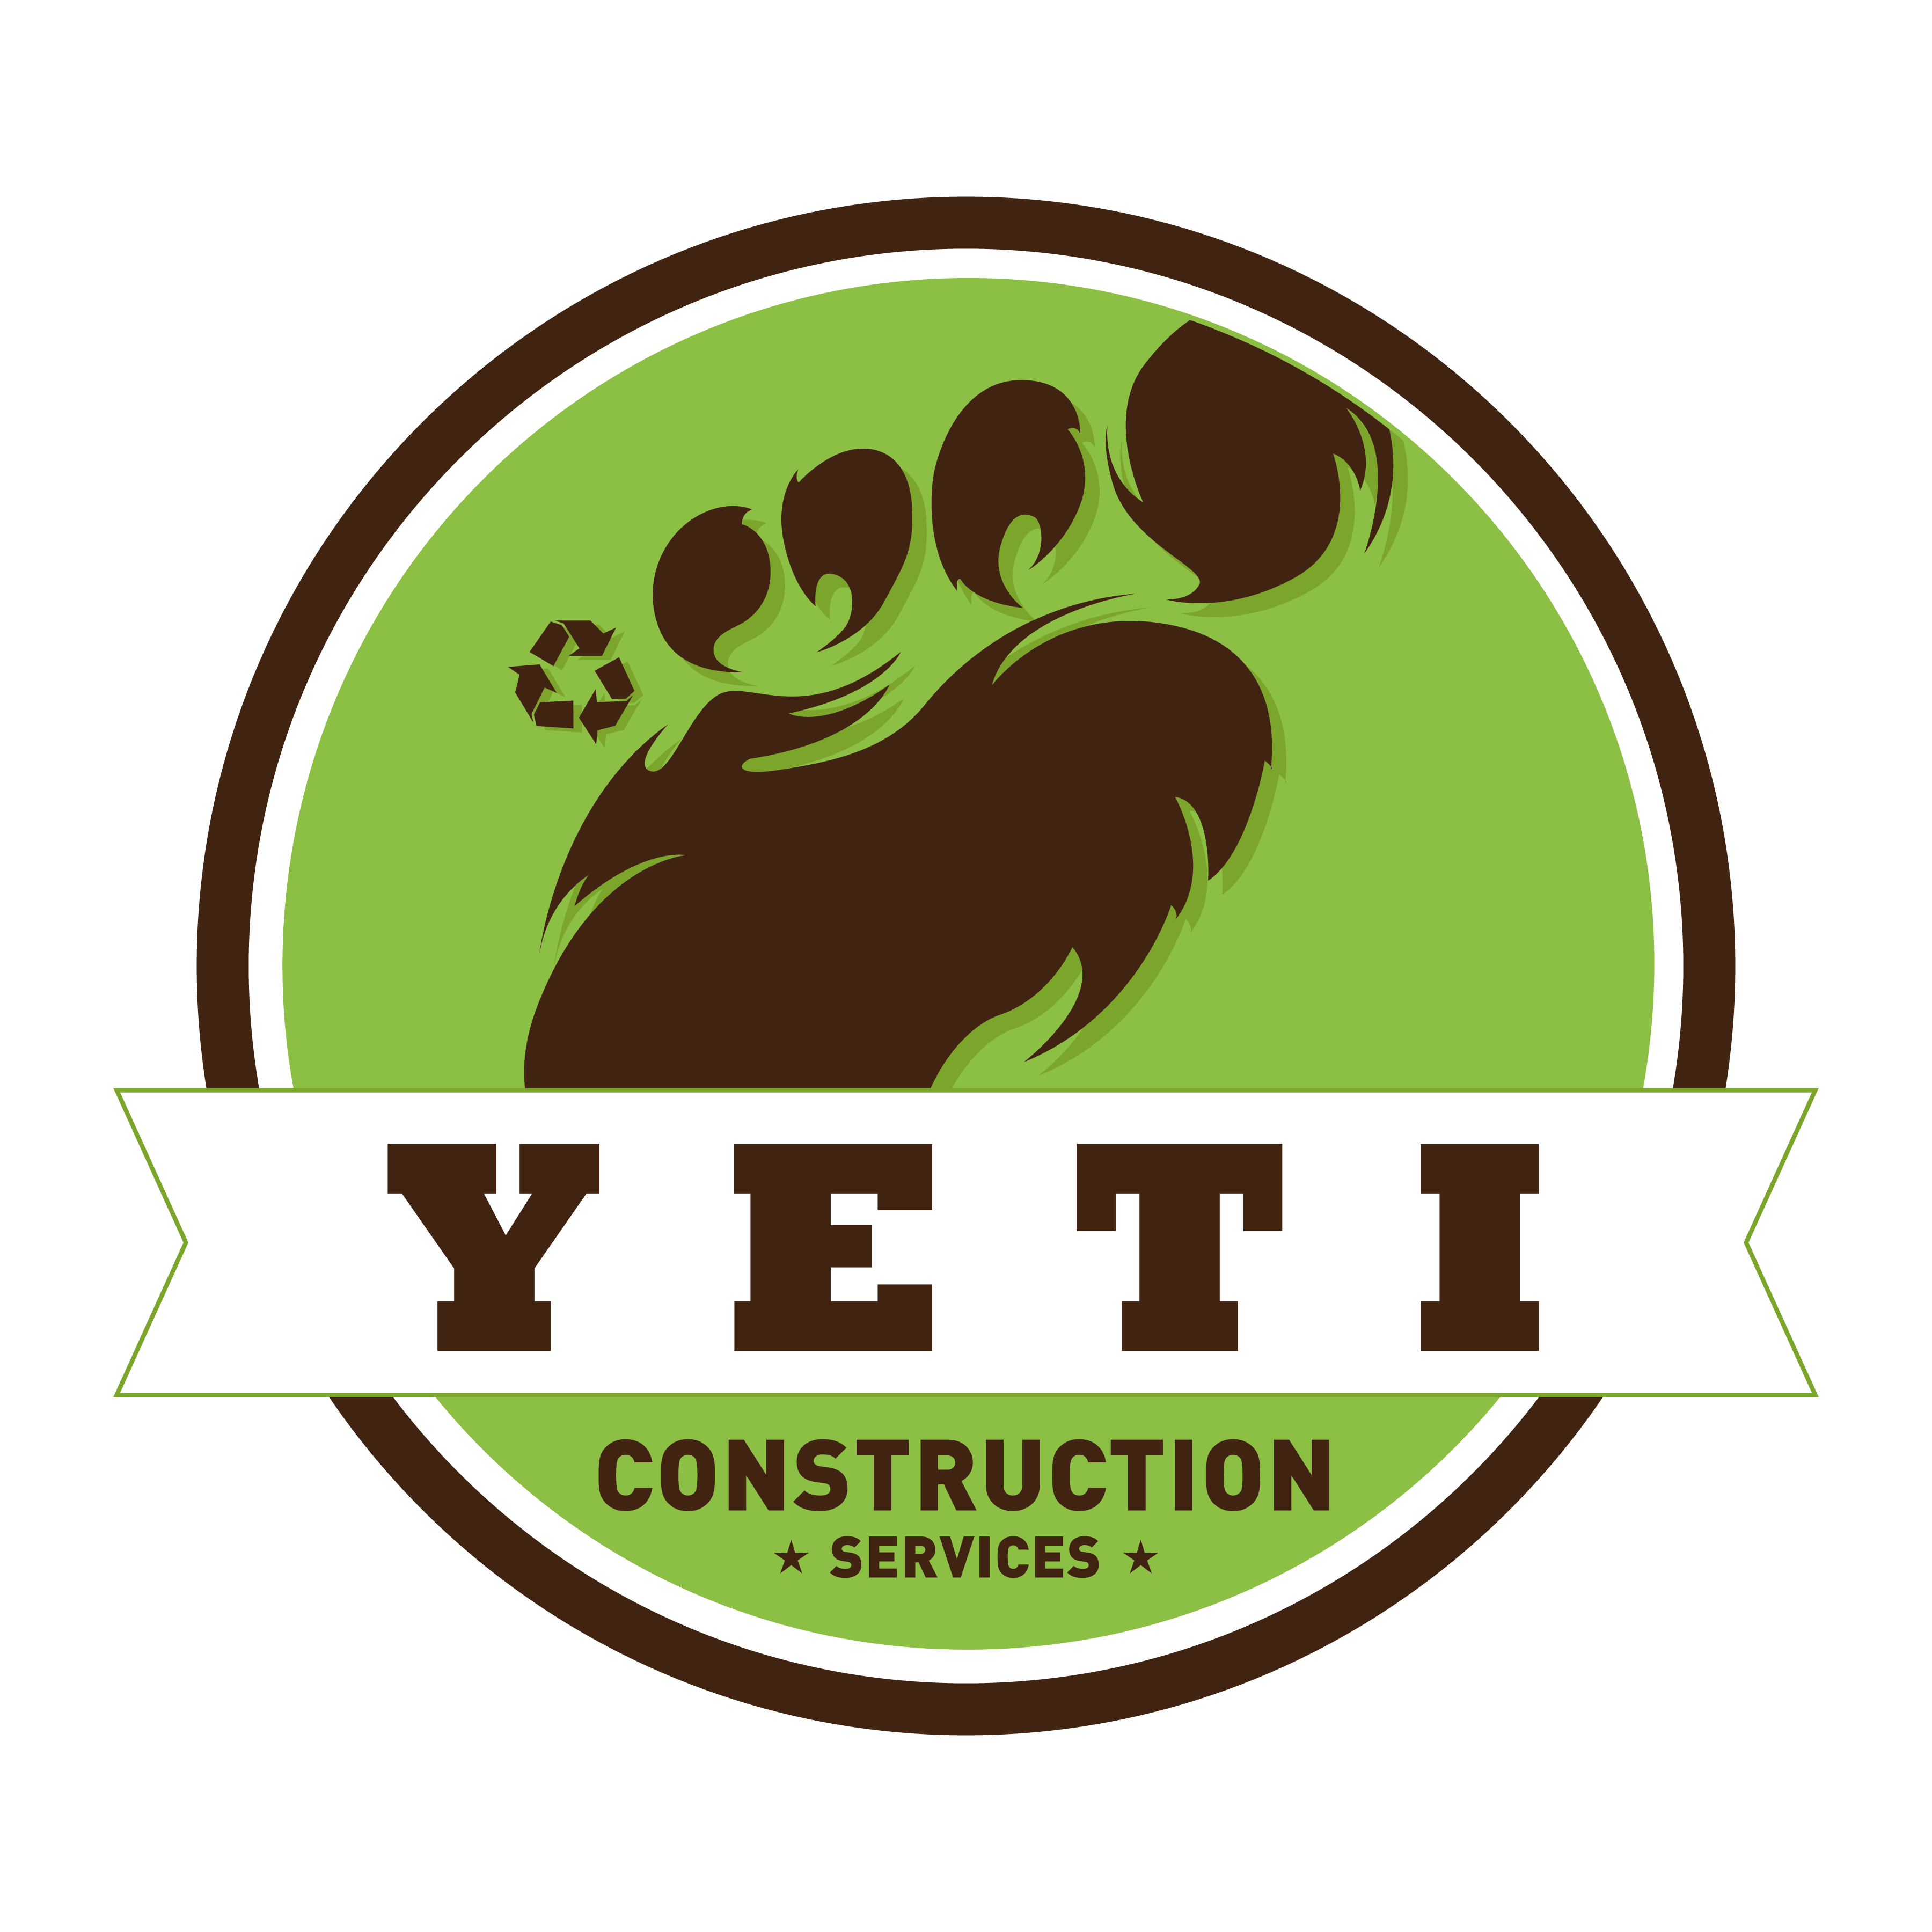 YETI CONSTRUCTION SERVICES